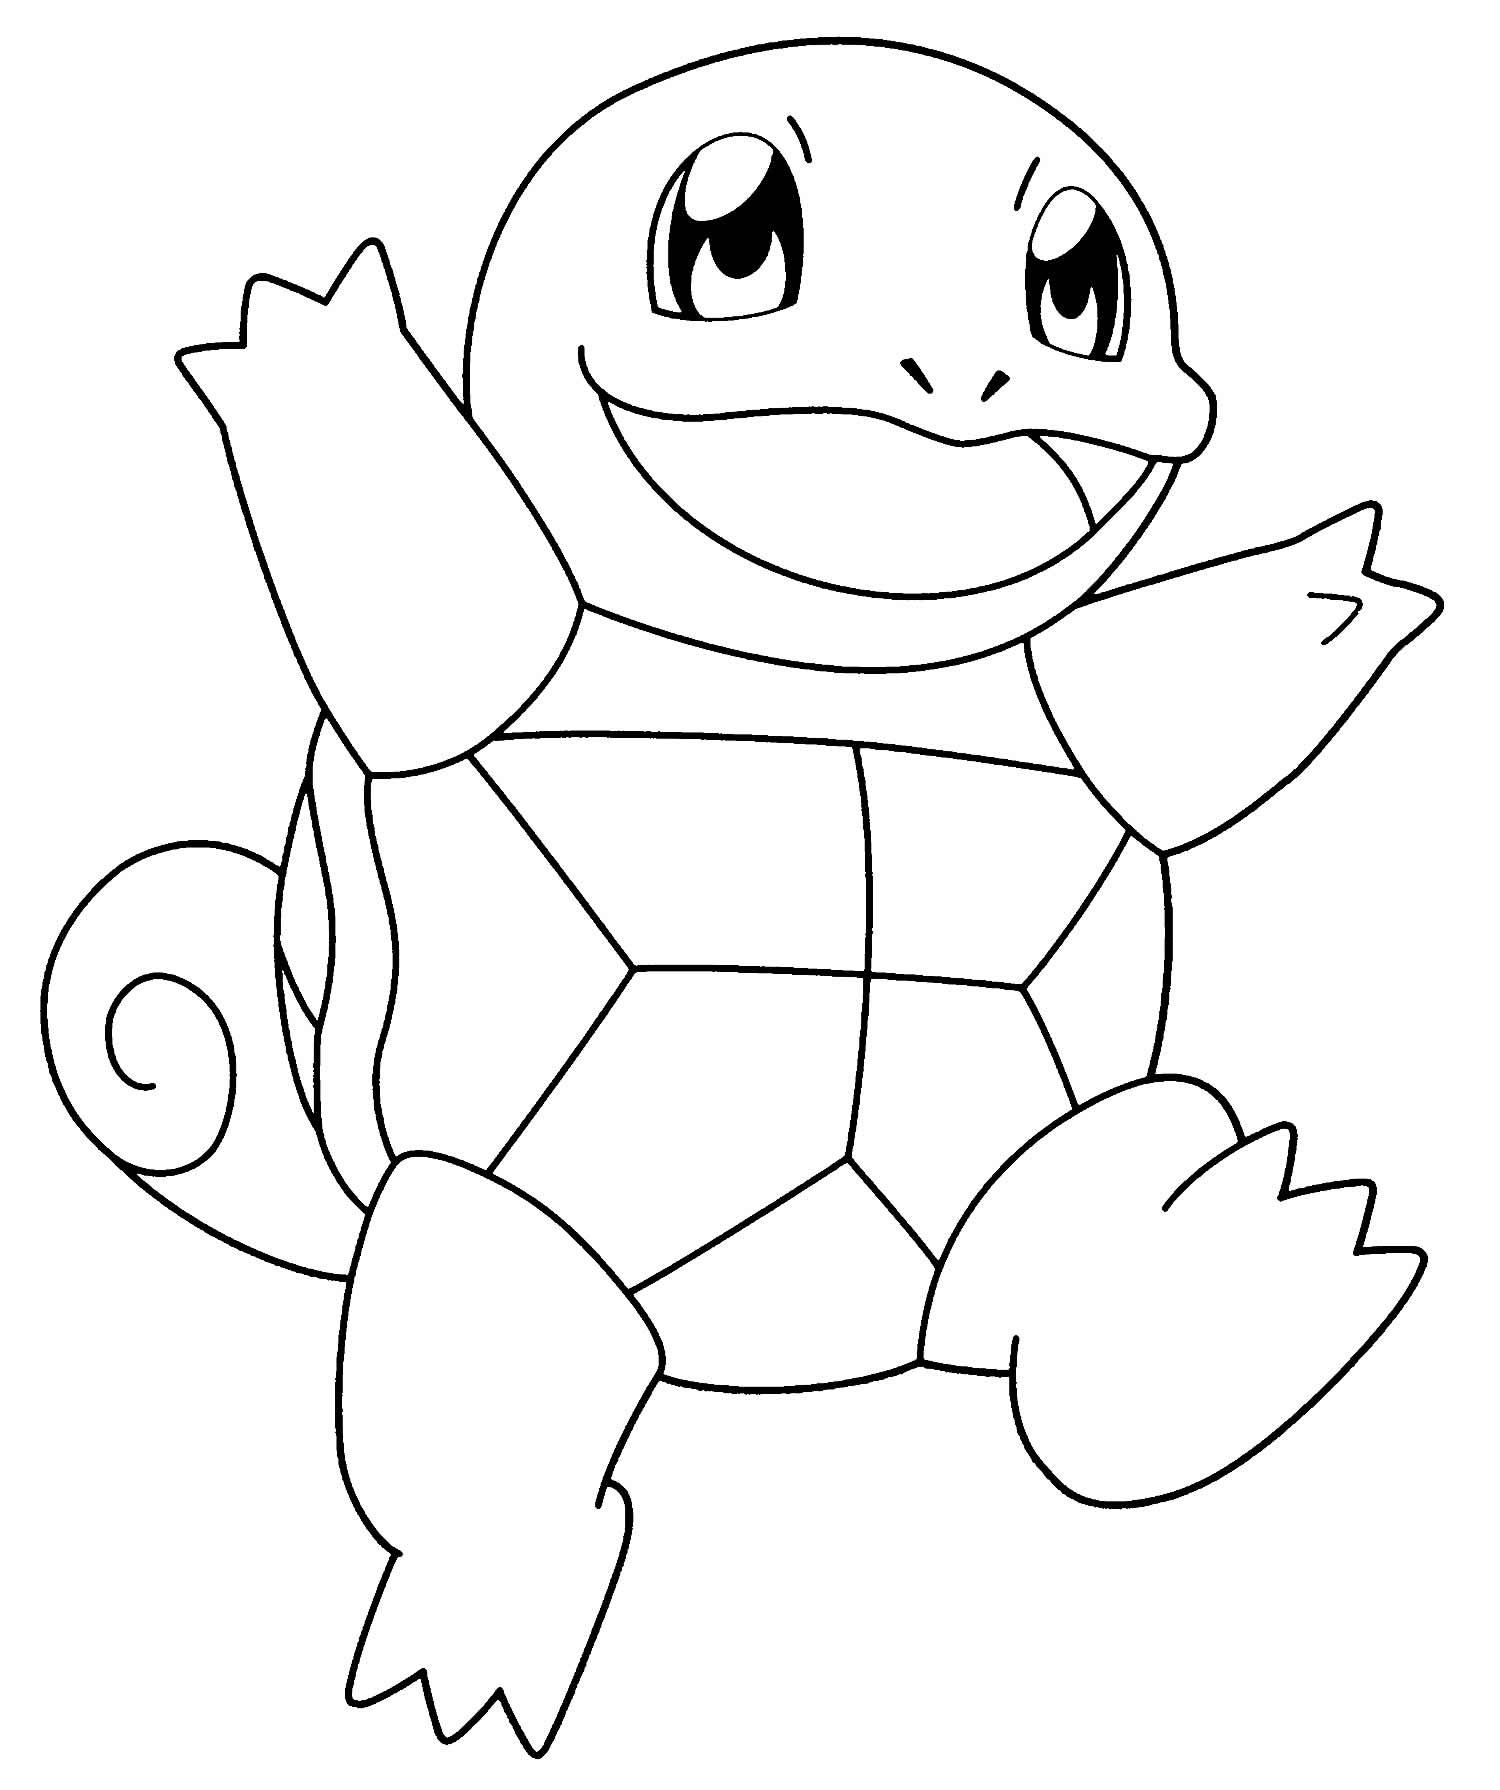 Pokémon drawing to paint